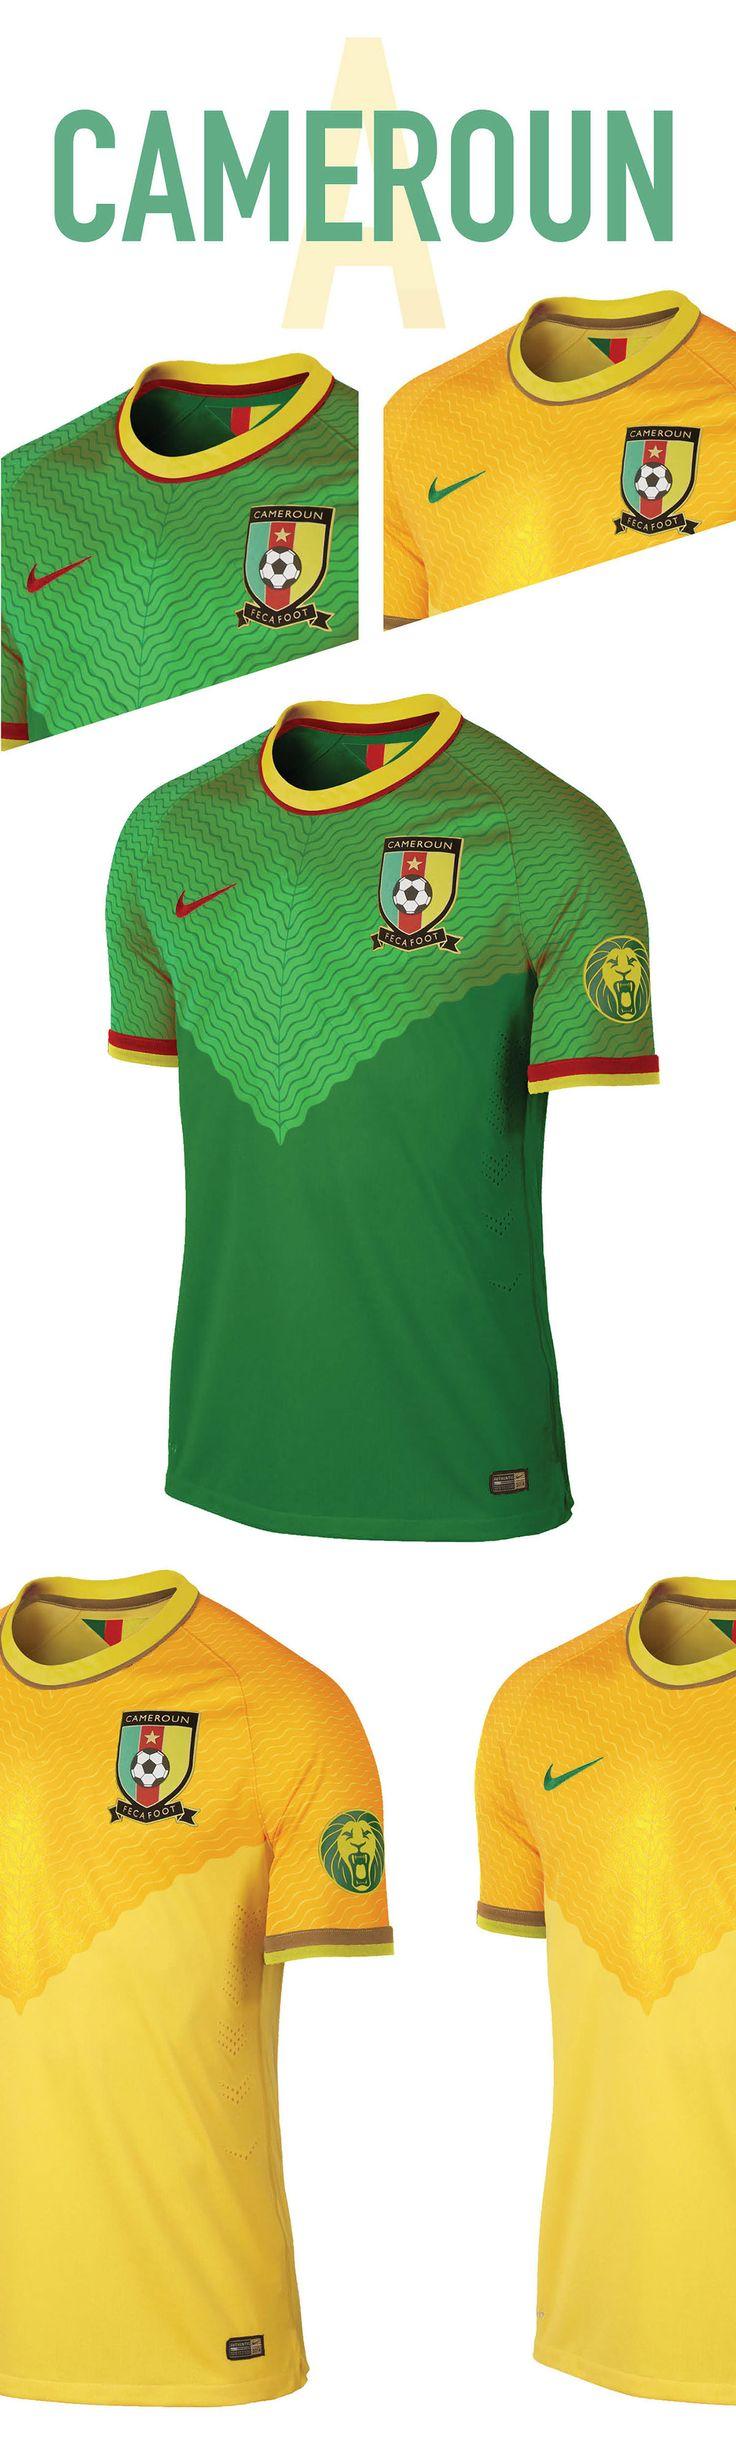 Shirt design concepts - Teams Concepts For Group C